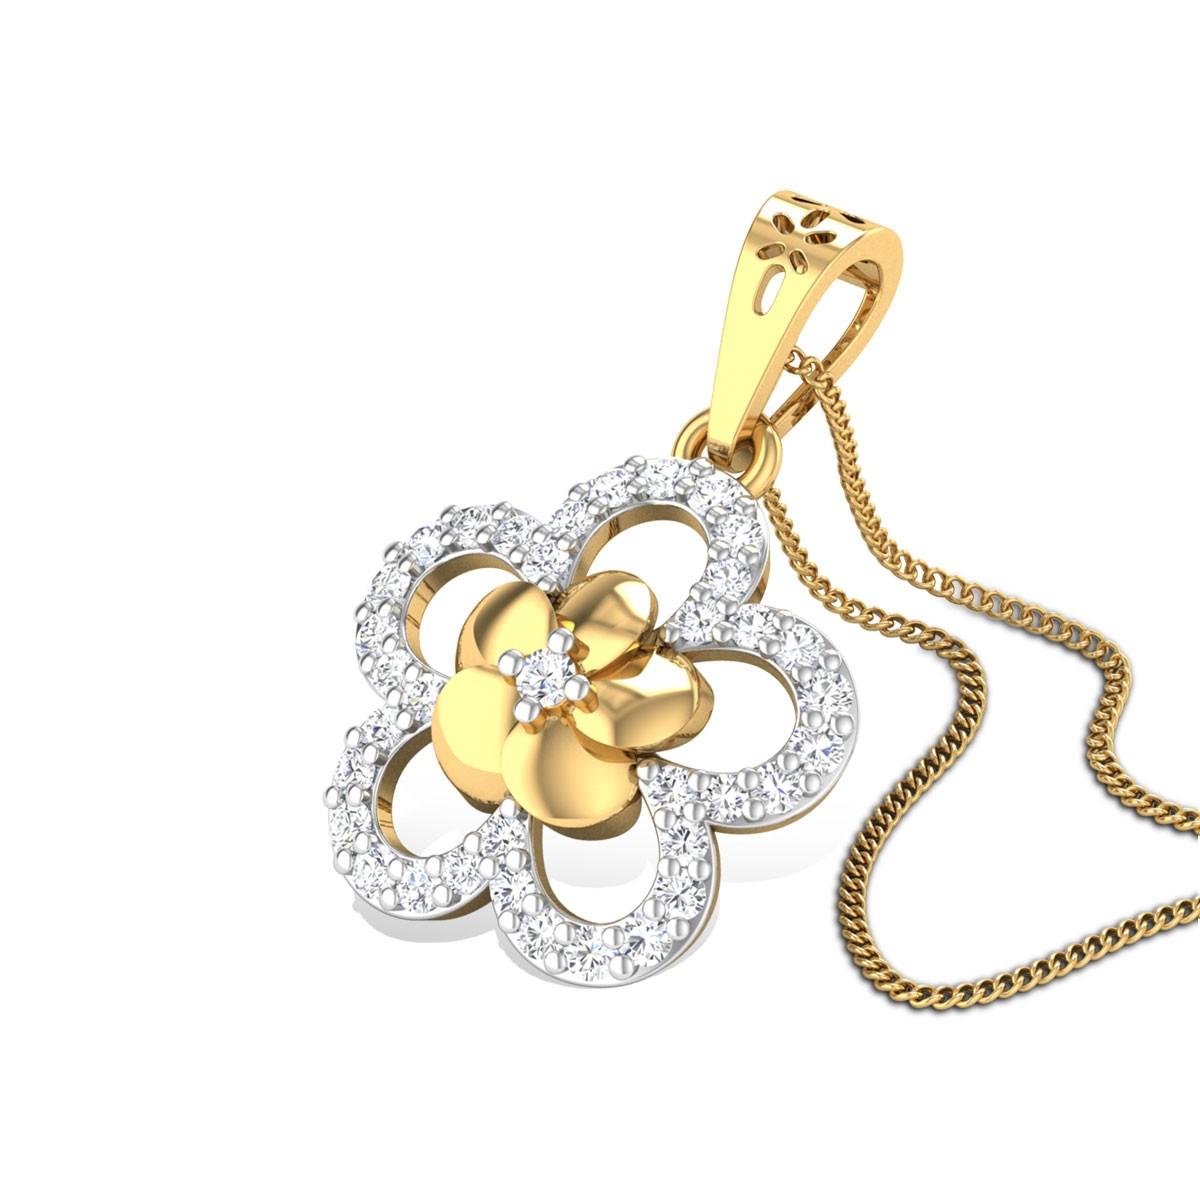 Double Lilly Diamond Pendant